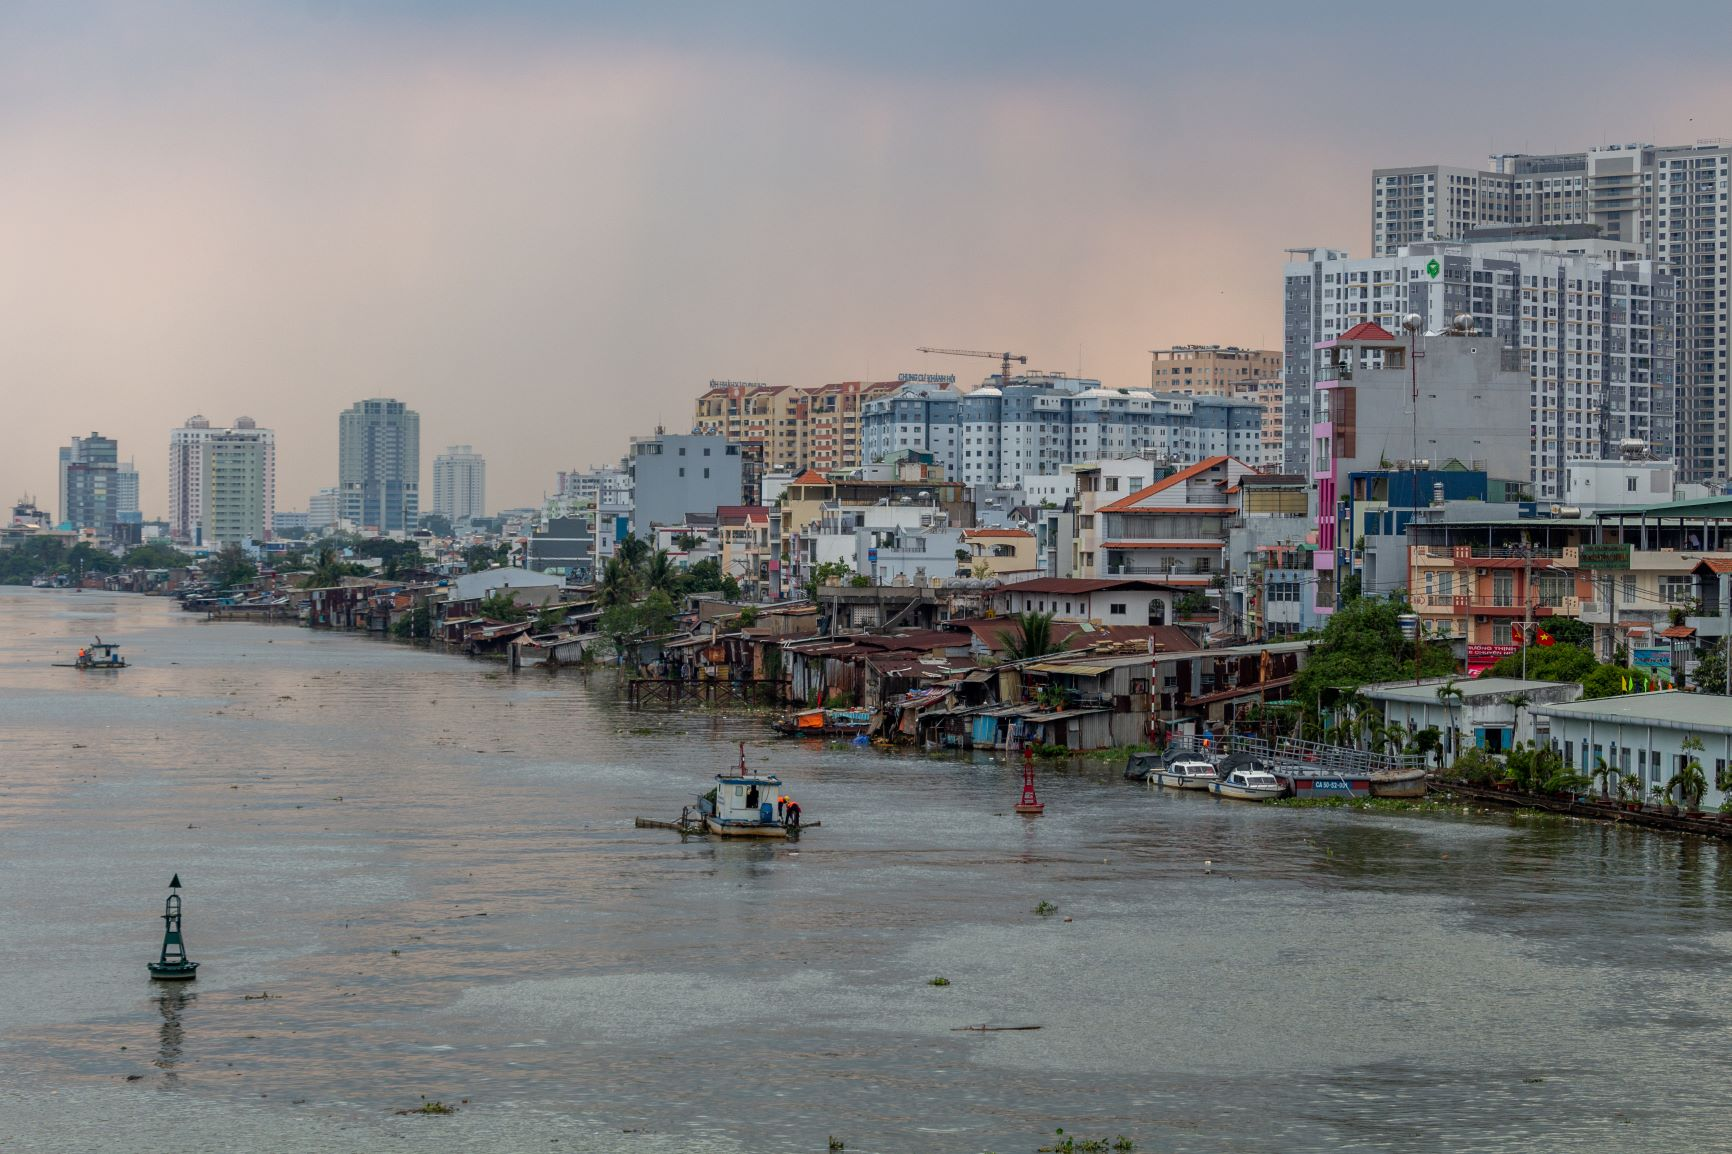 Vietnam ranks first on our Fintech Financial Inclusion Scorecard